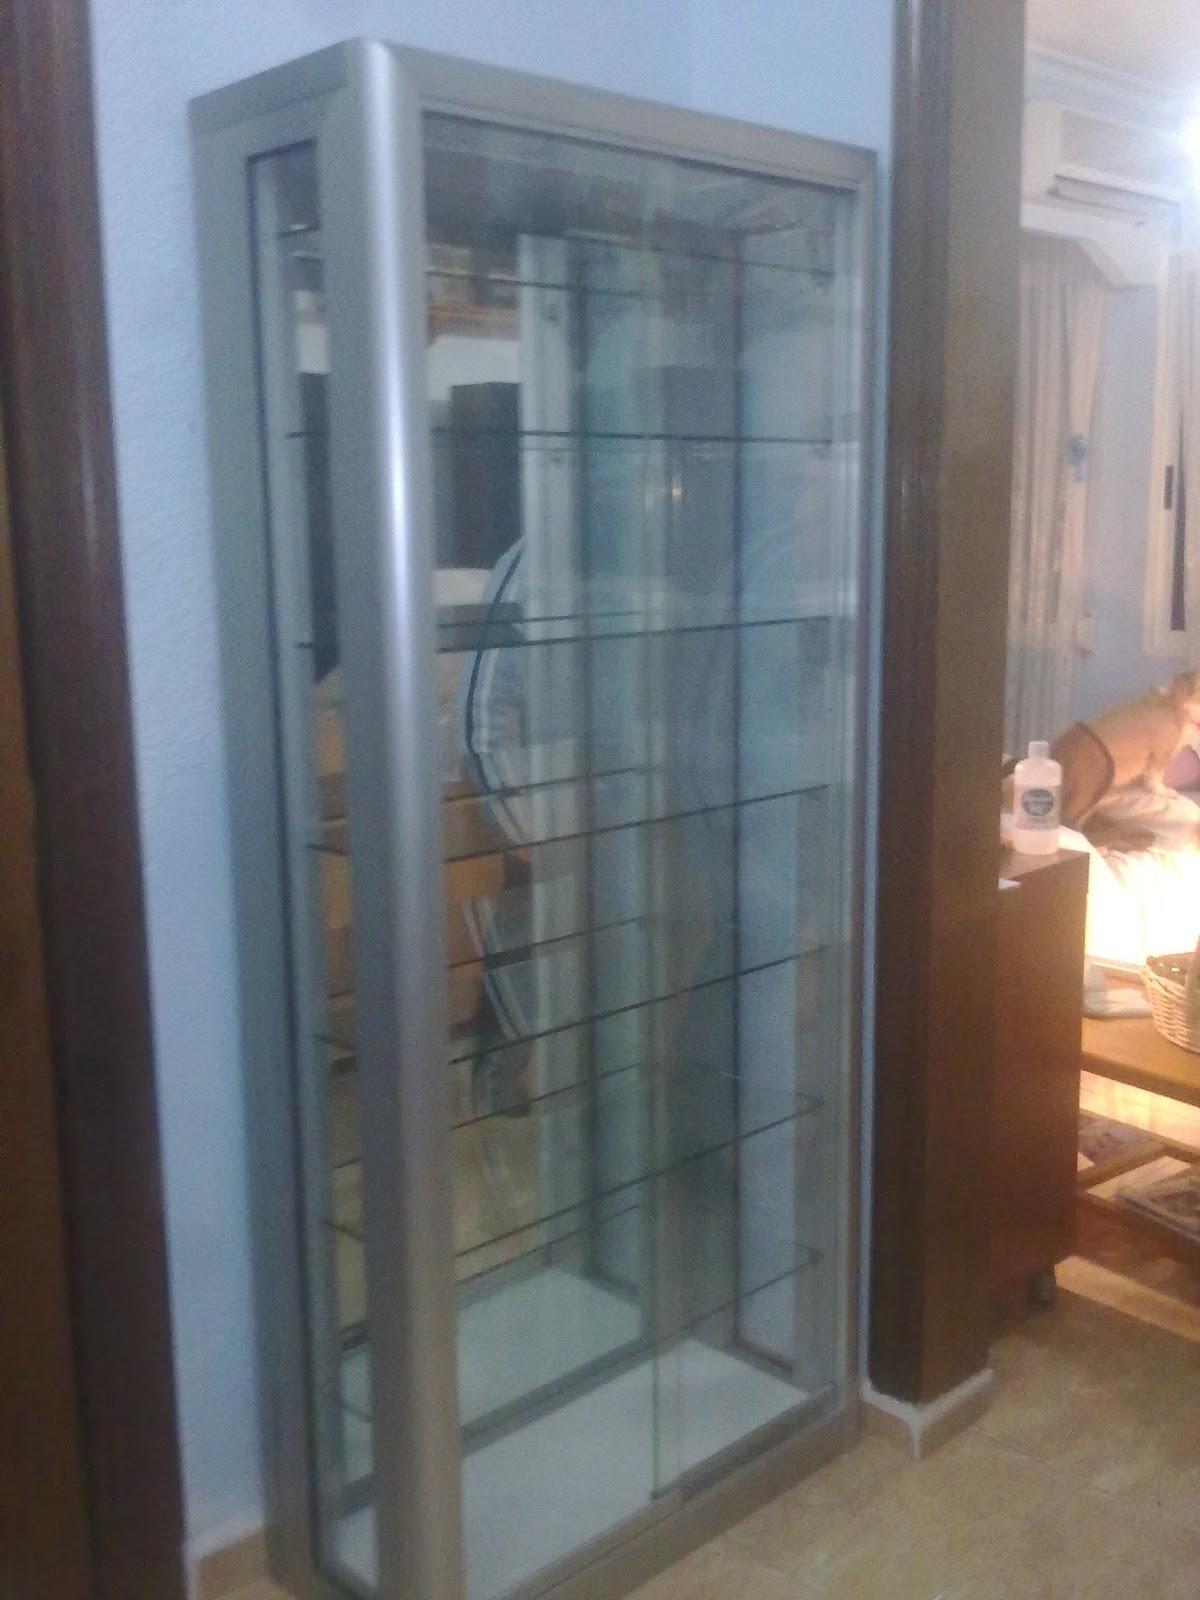 Maringlass aluminio vidrio urnas de cristal y vitrinas - Estanterias para dedales ...